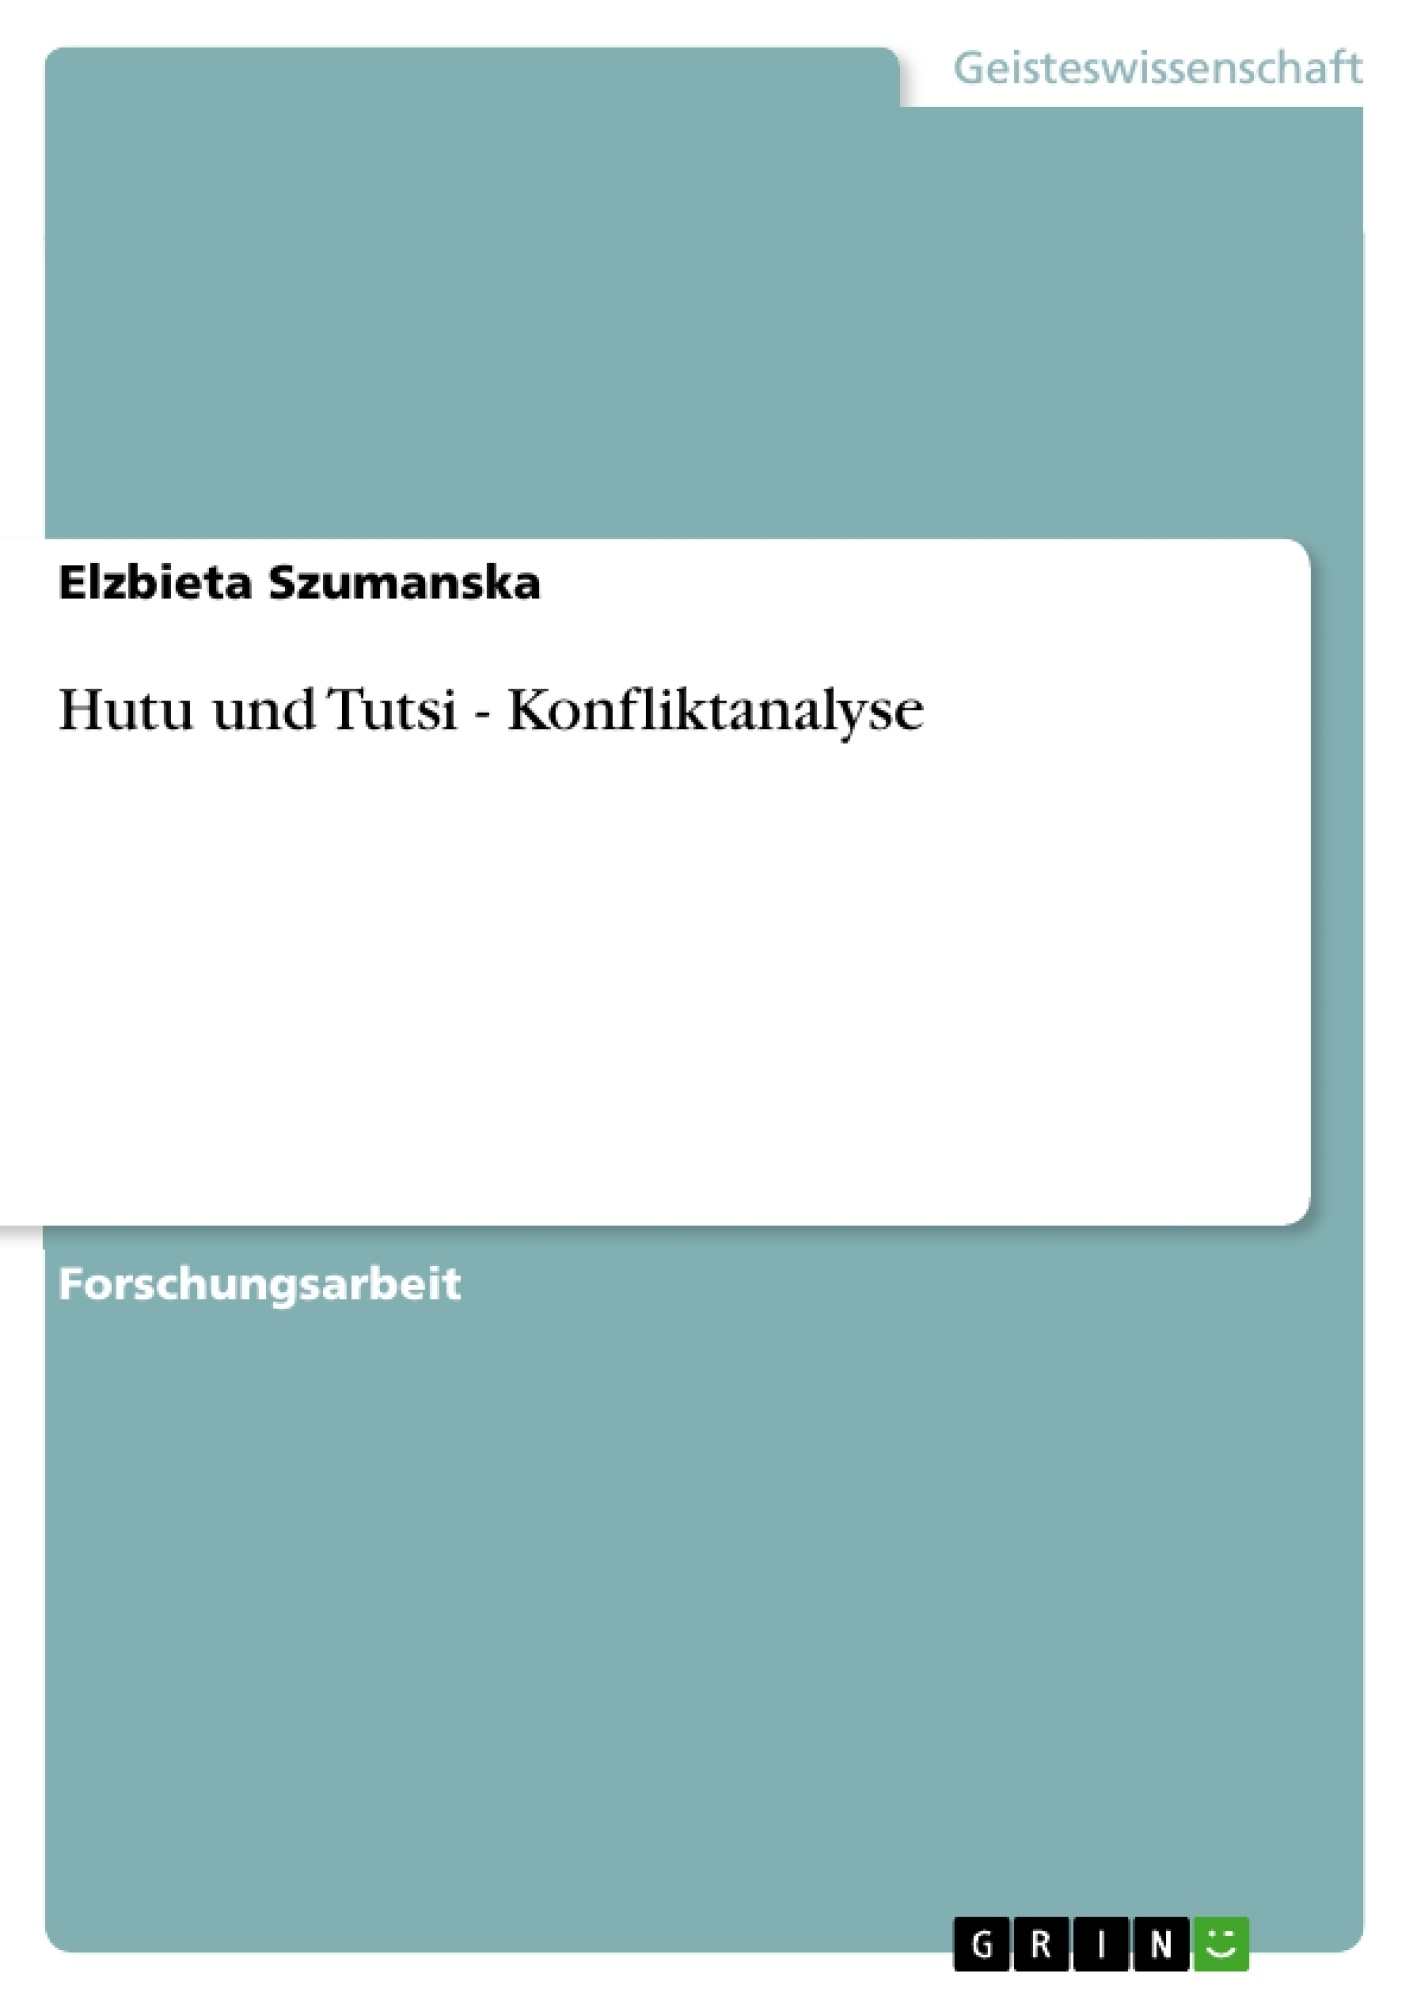 Titel: Hutu und Tutsi - Konfliktanalyse